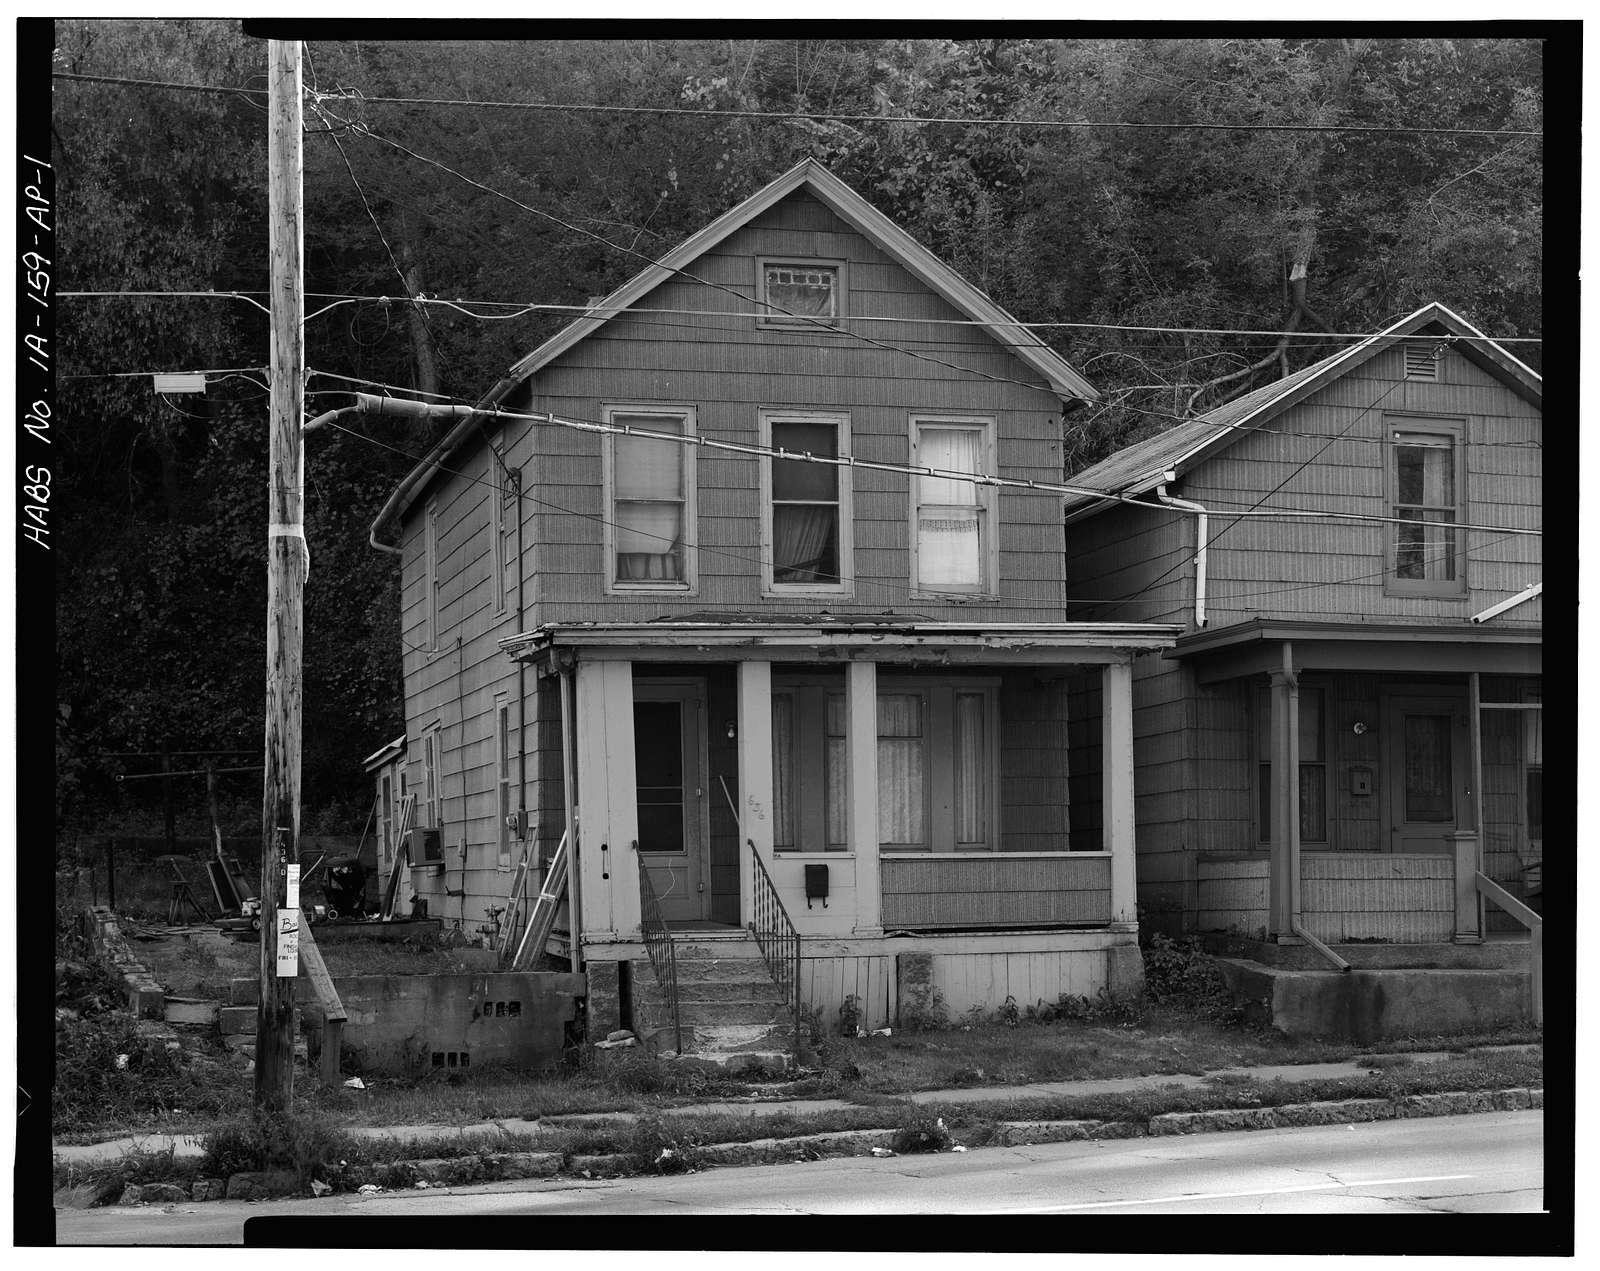 Workingmen's Houses, Patrick Scarry House, 636 Dodge Street, Dubuque, Dubuque County, IA